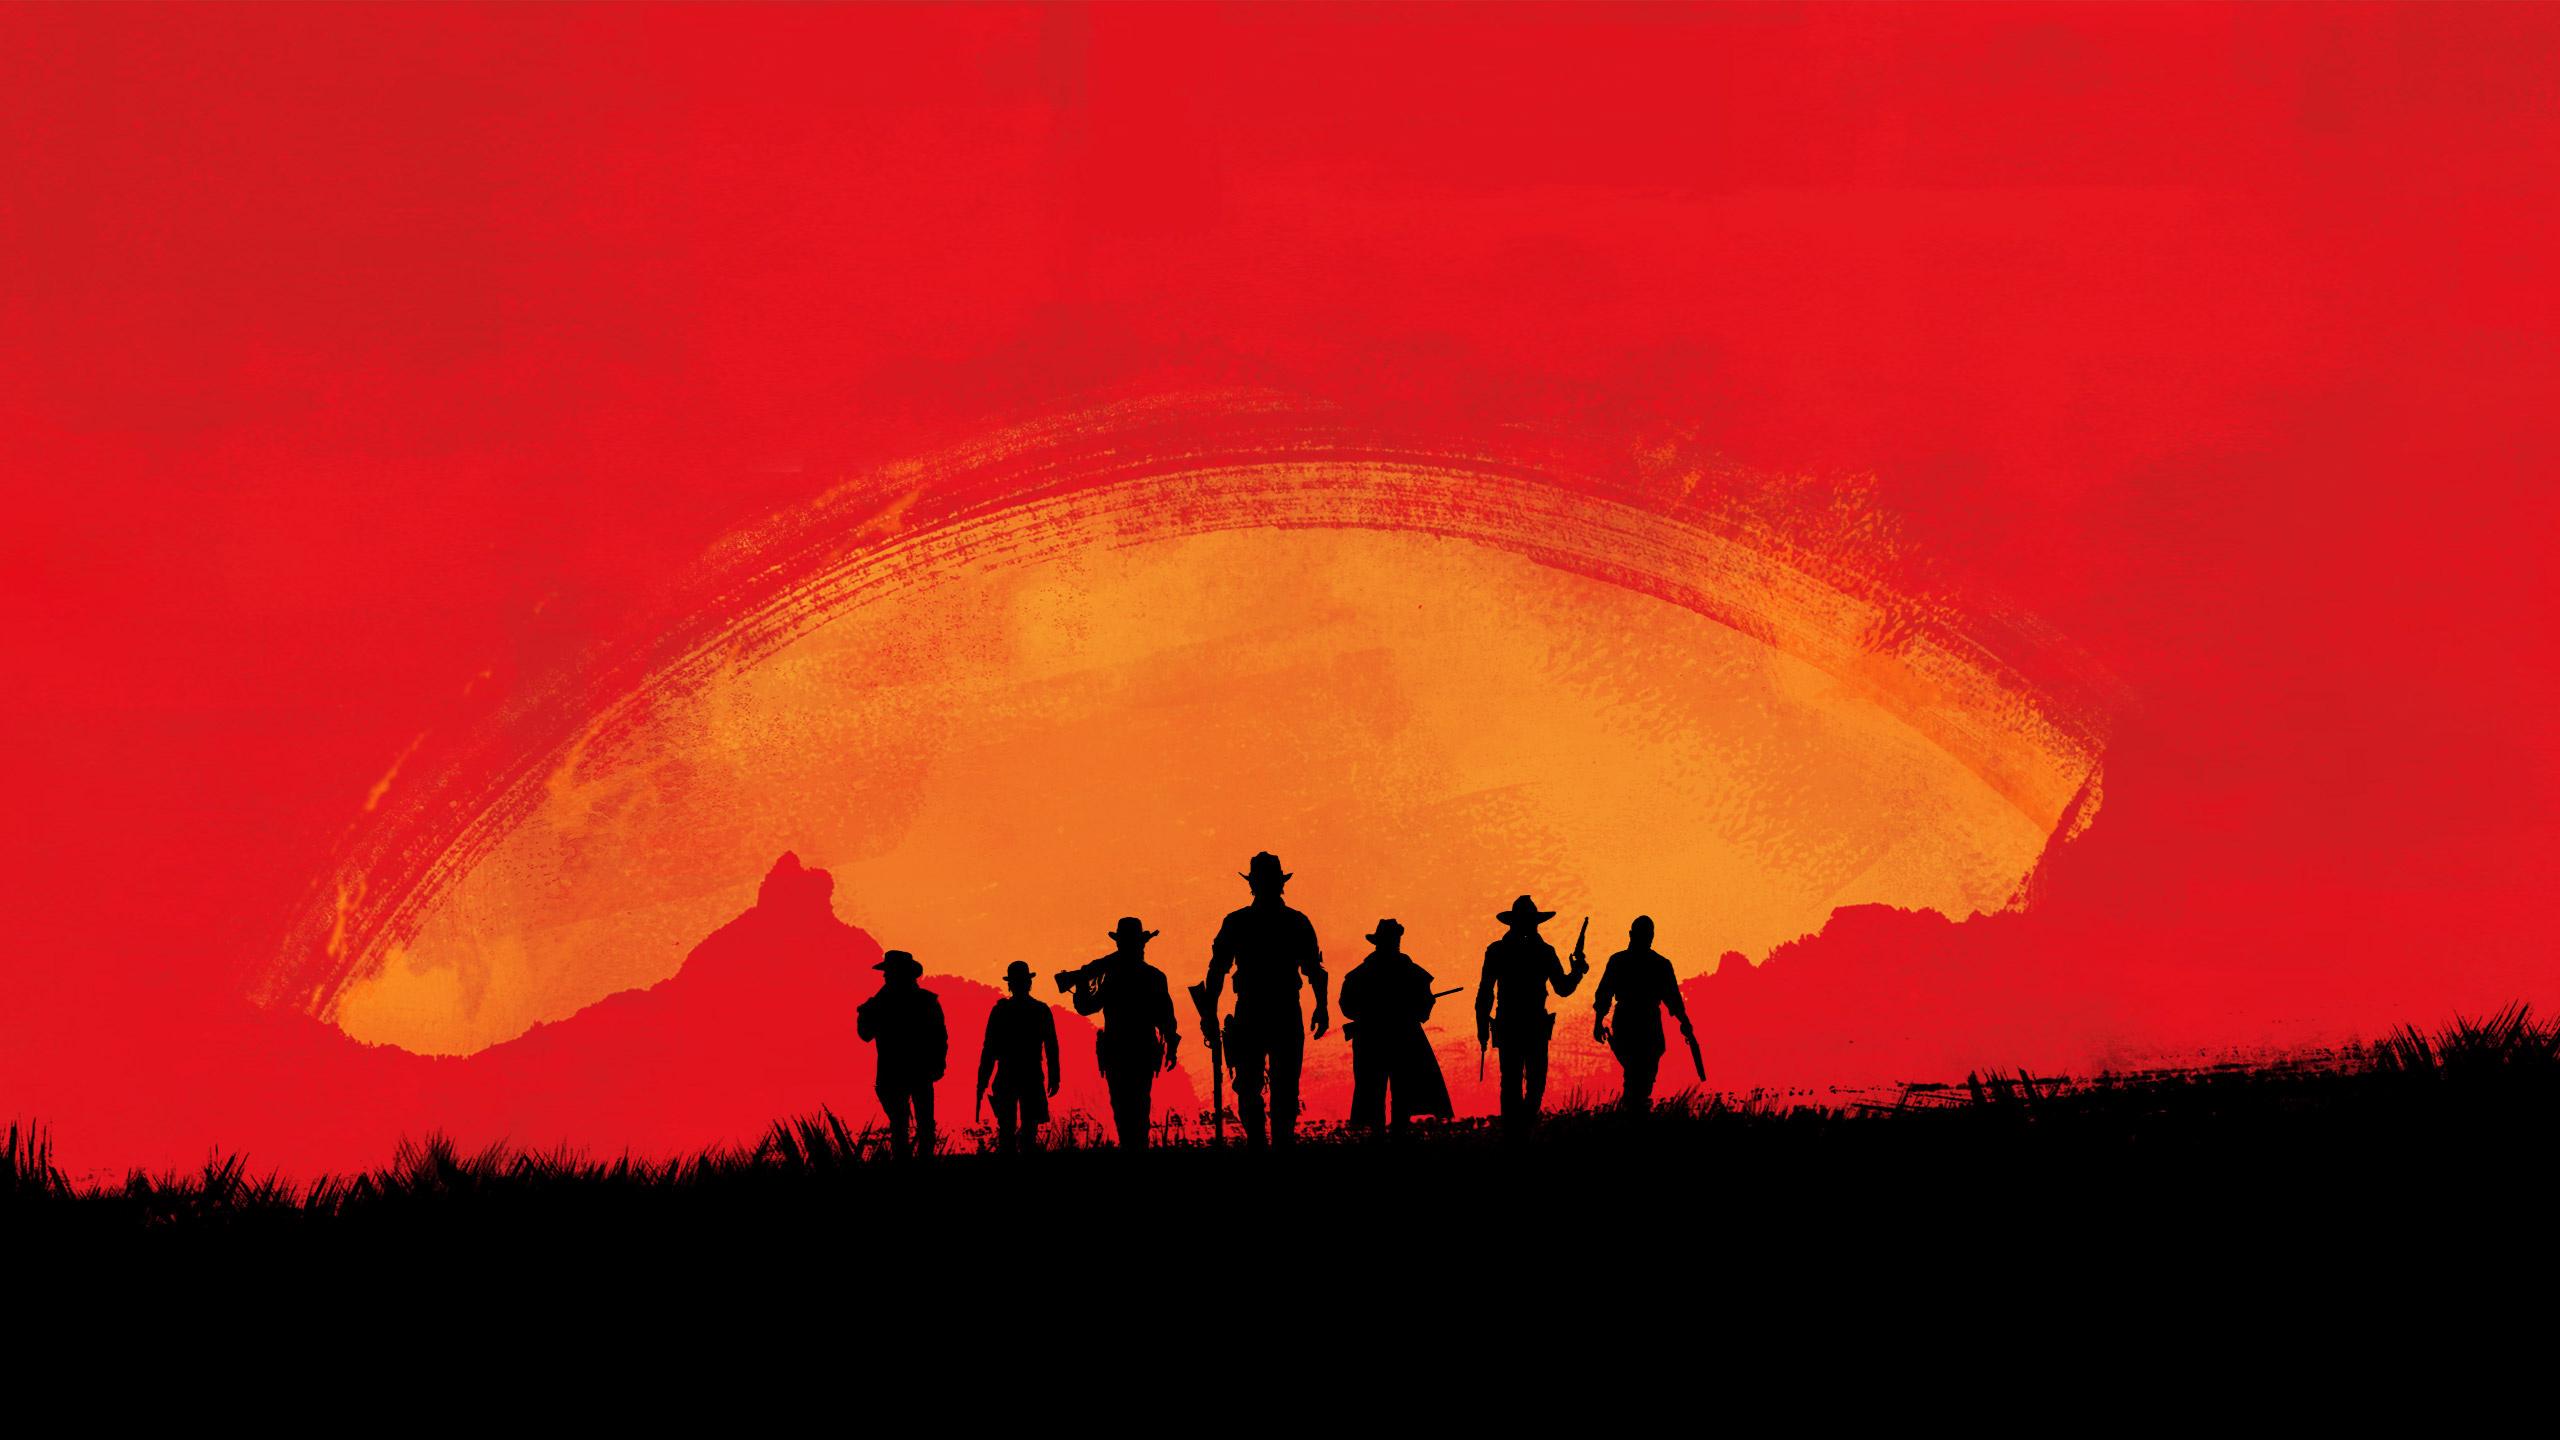 750703.jpg - Red Dead Redemption 2 арт